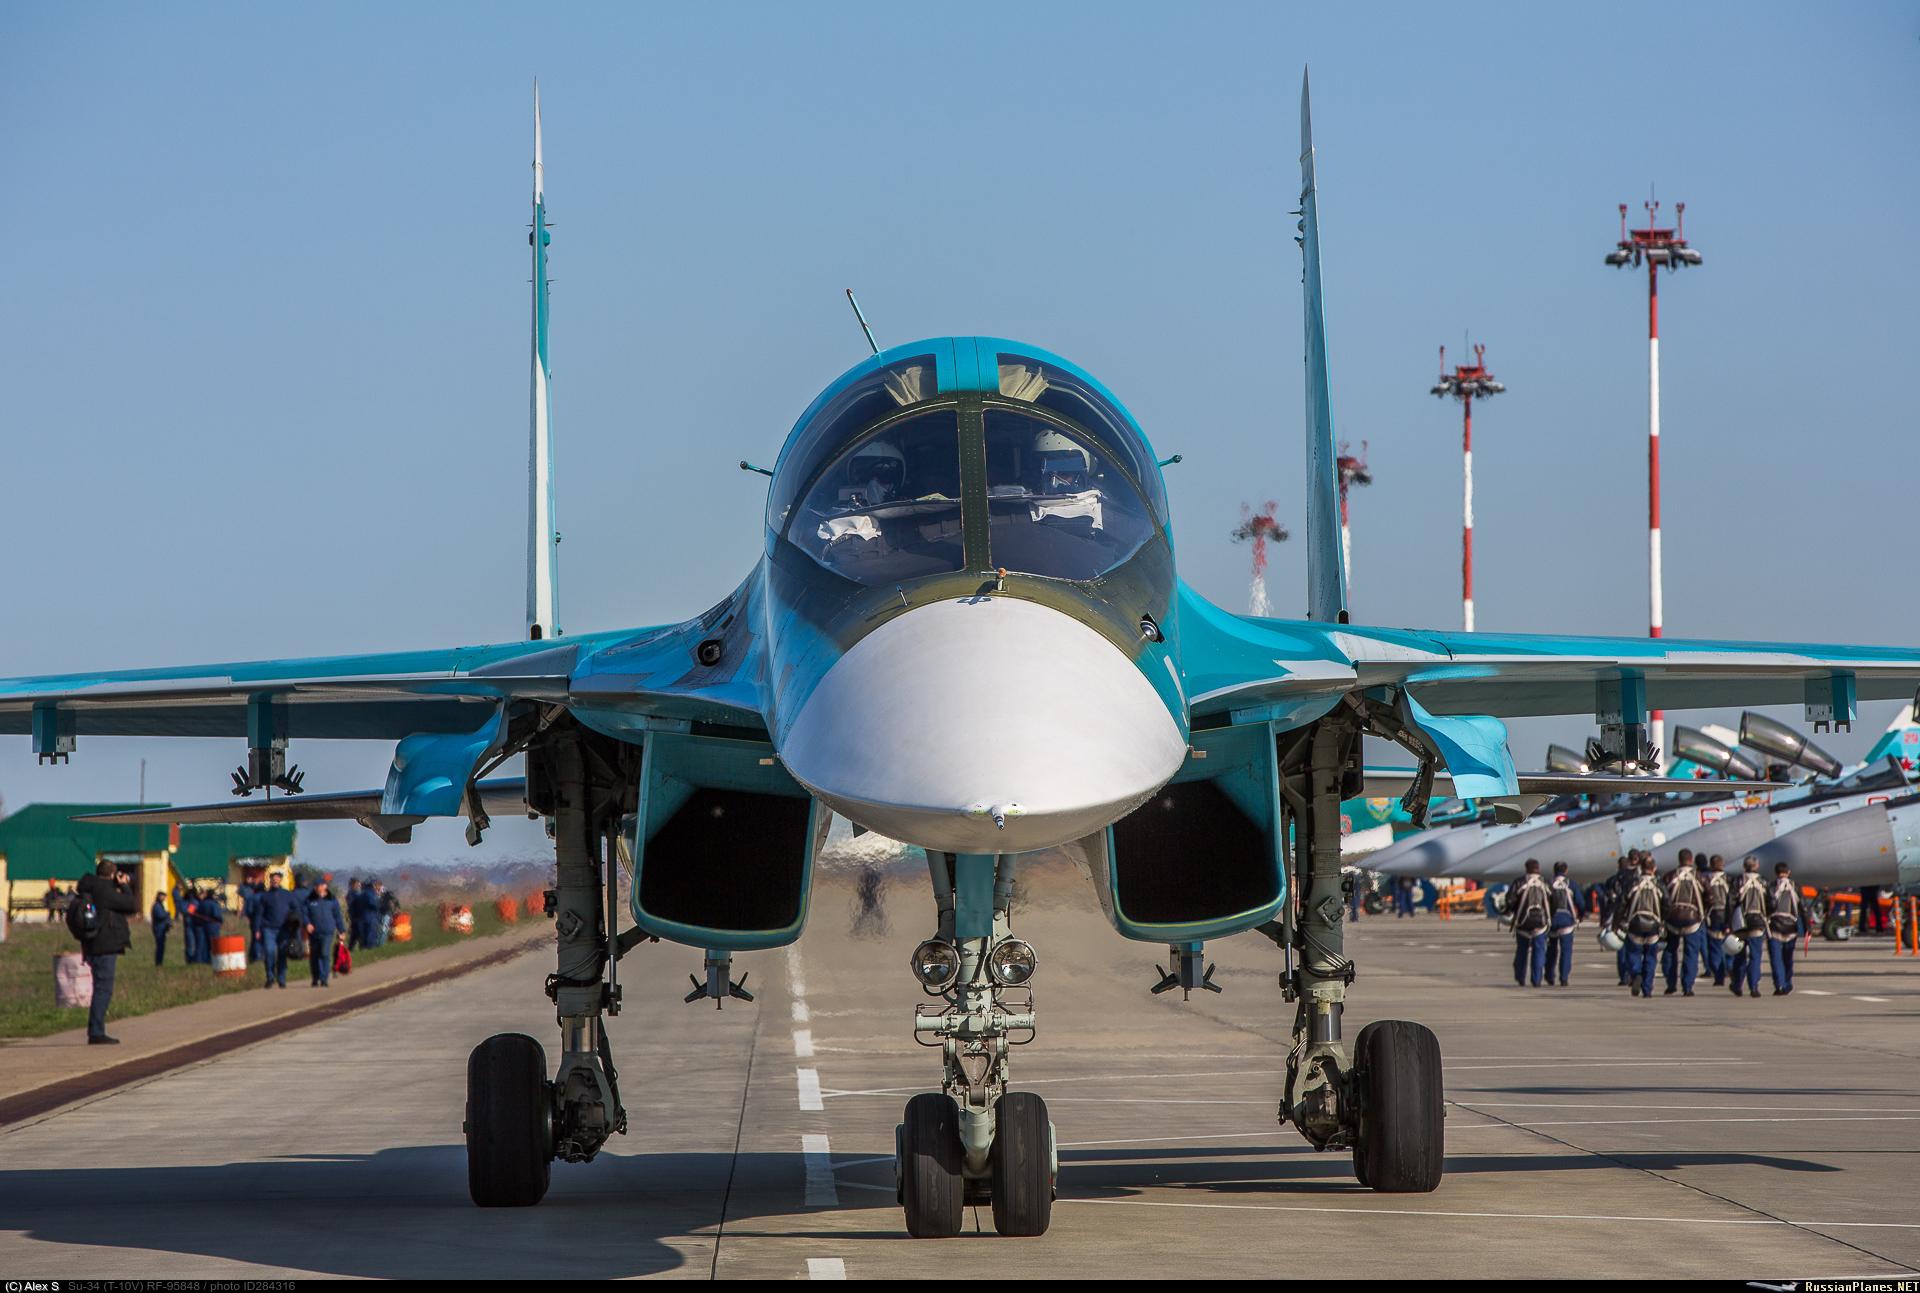 https://russianplanes.net/images/to285000/284316.jpg